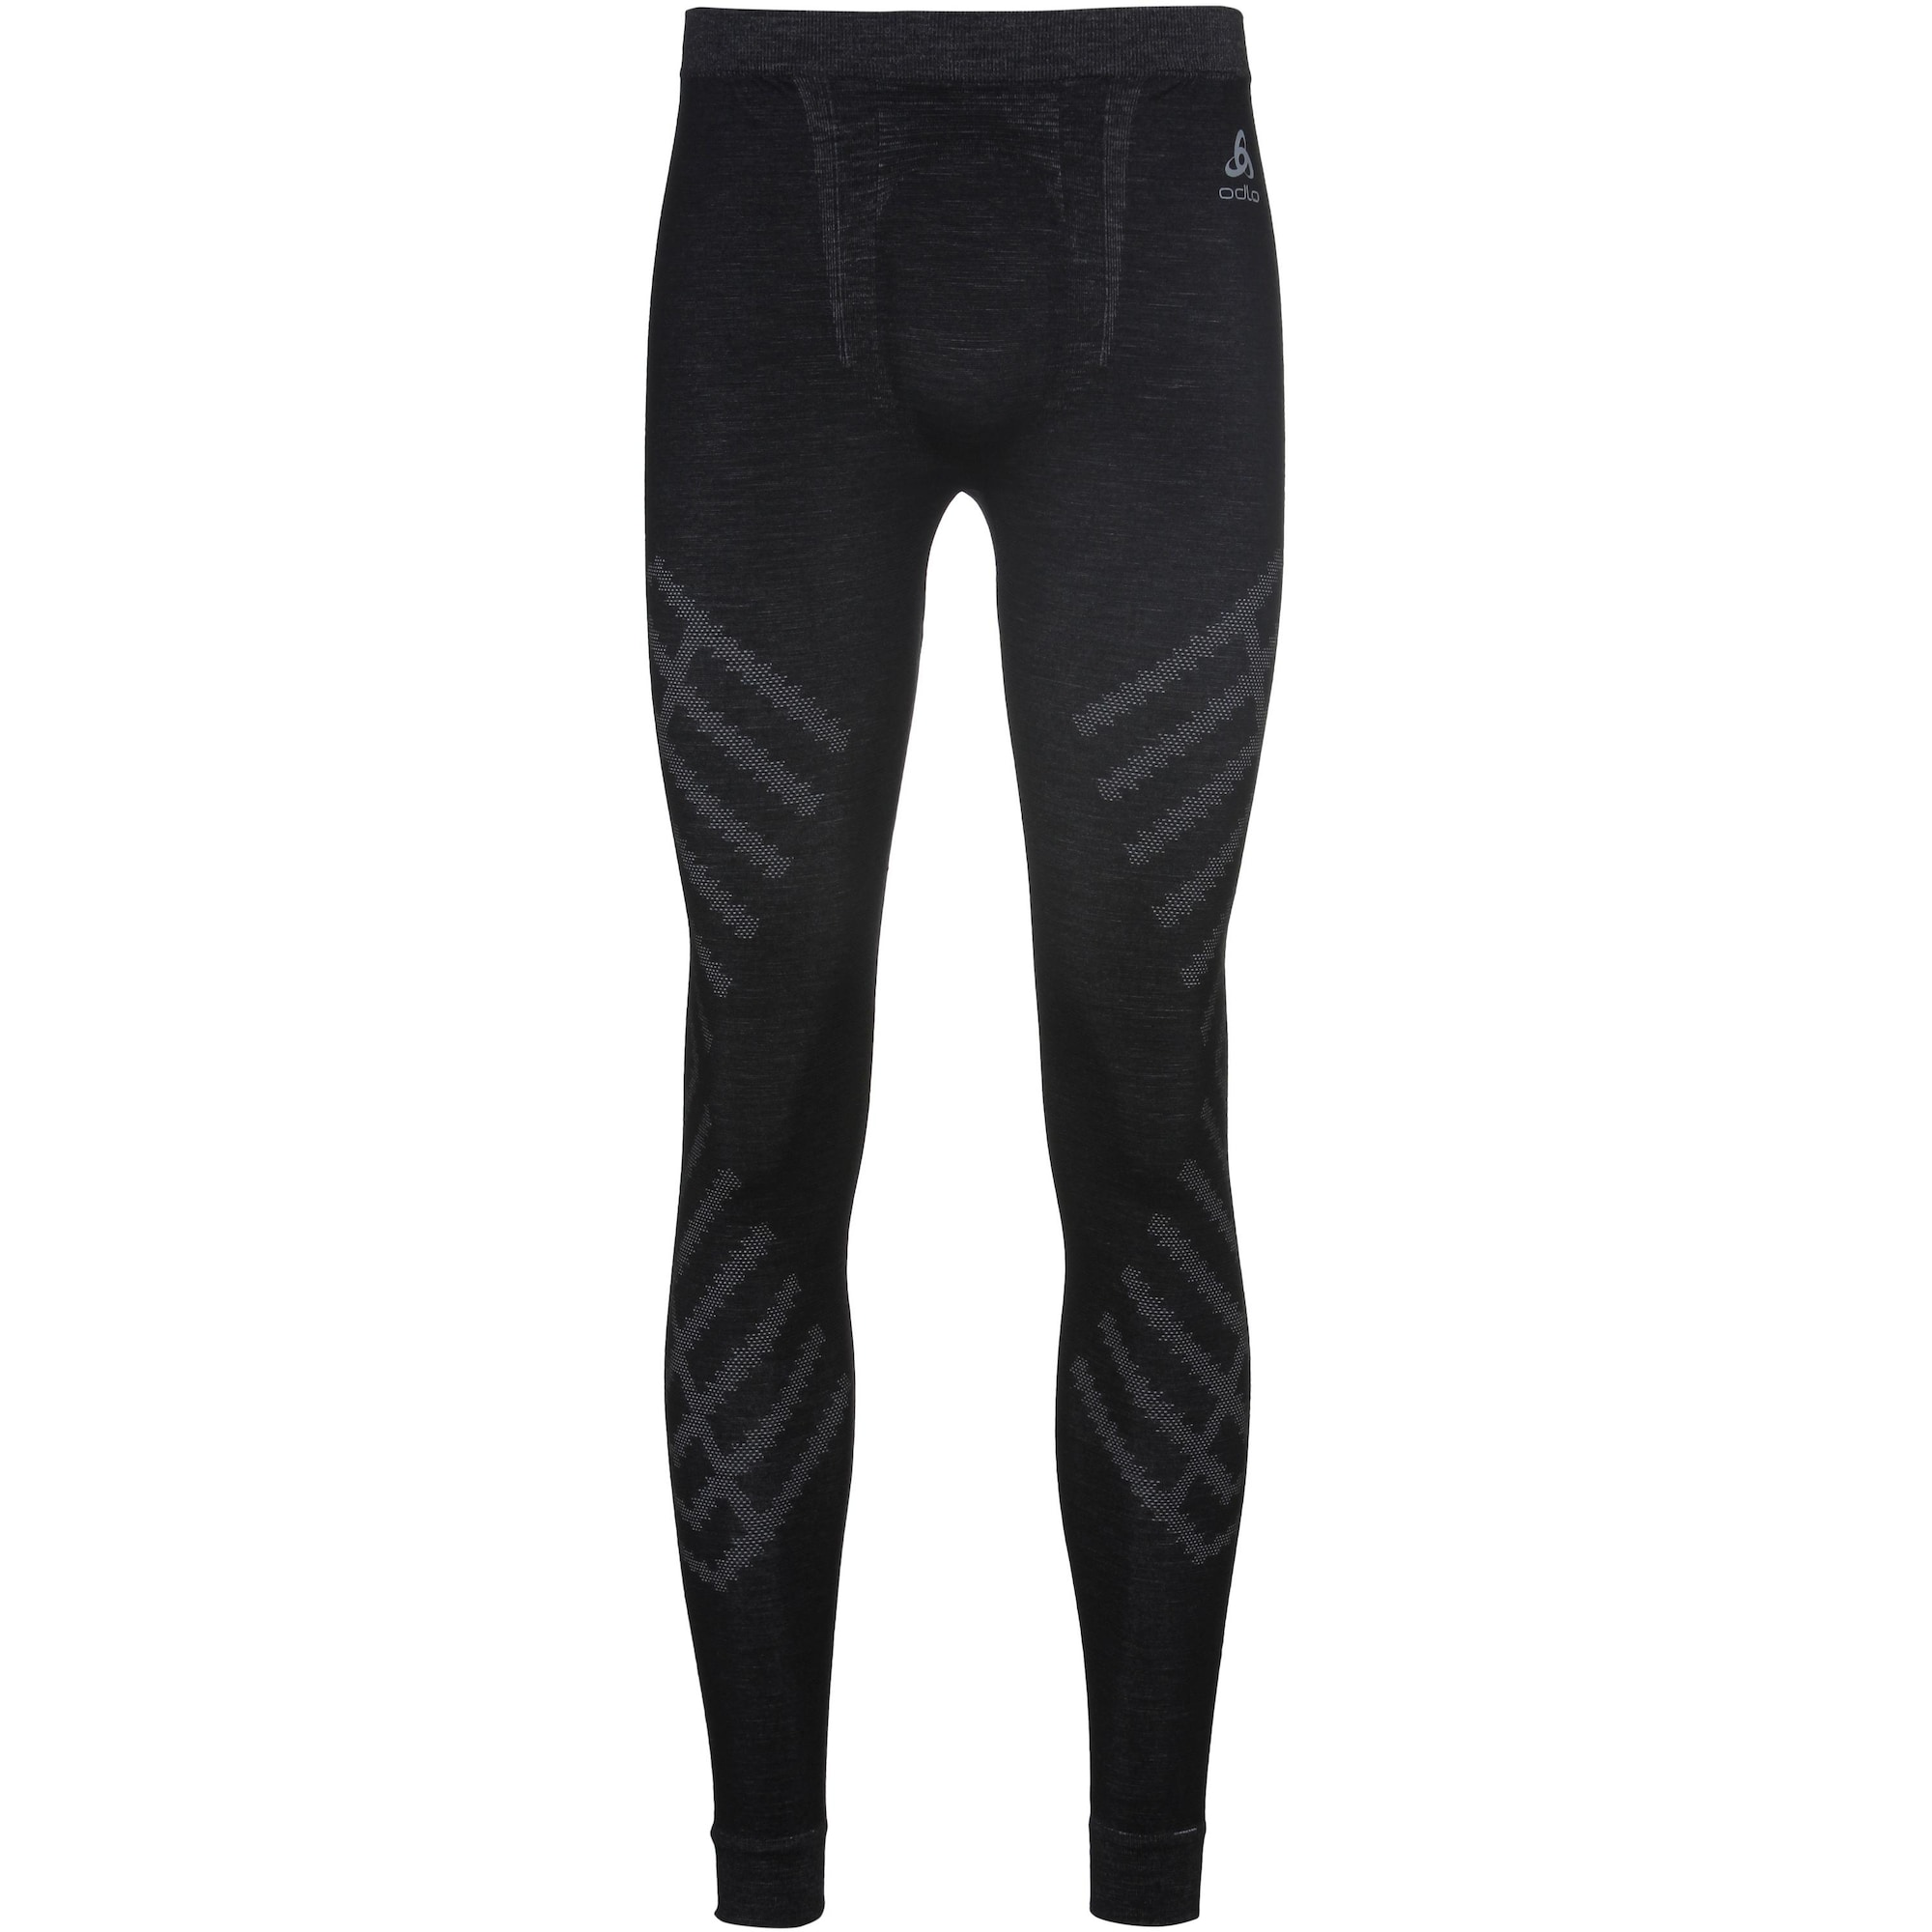 Funktionsunterhose 'Merino' | Sportbekleidung > Funktionswäsche | ODLO